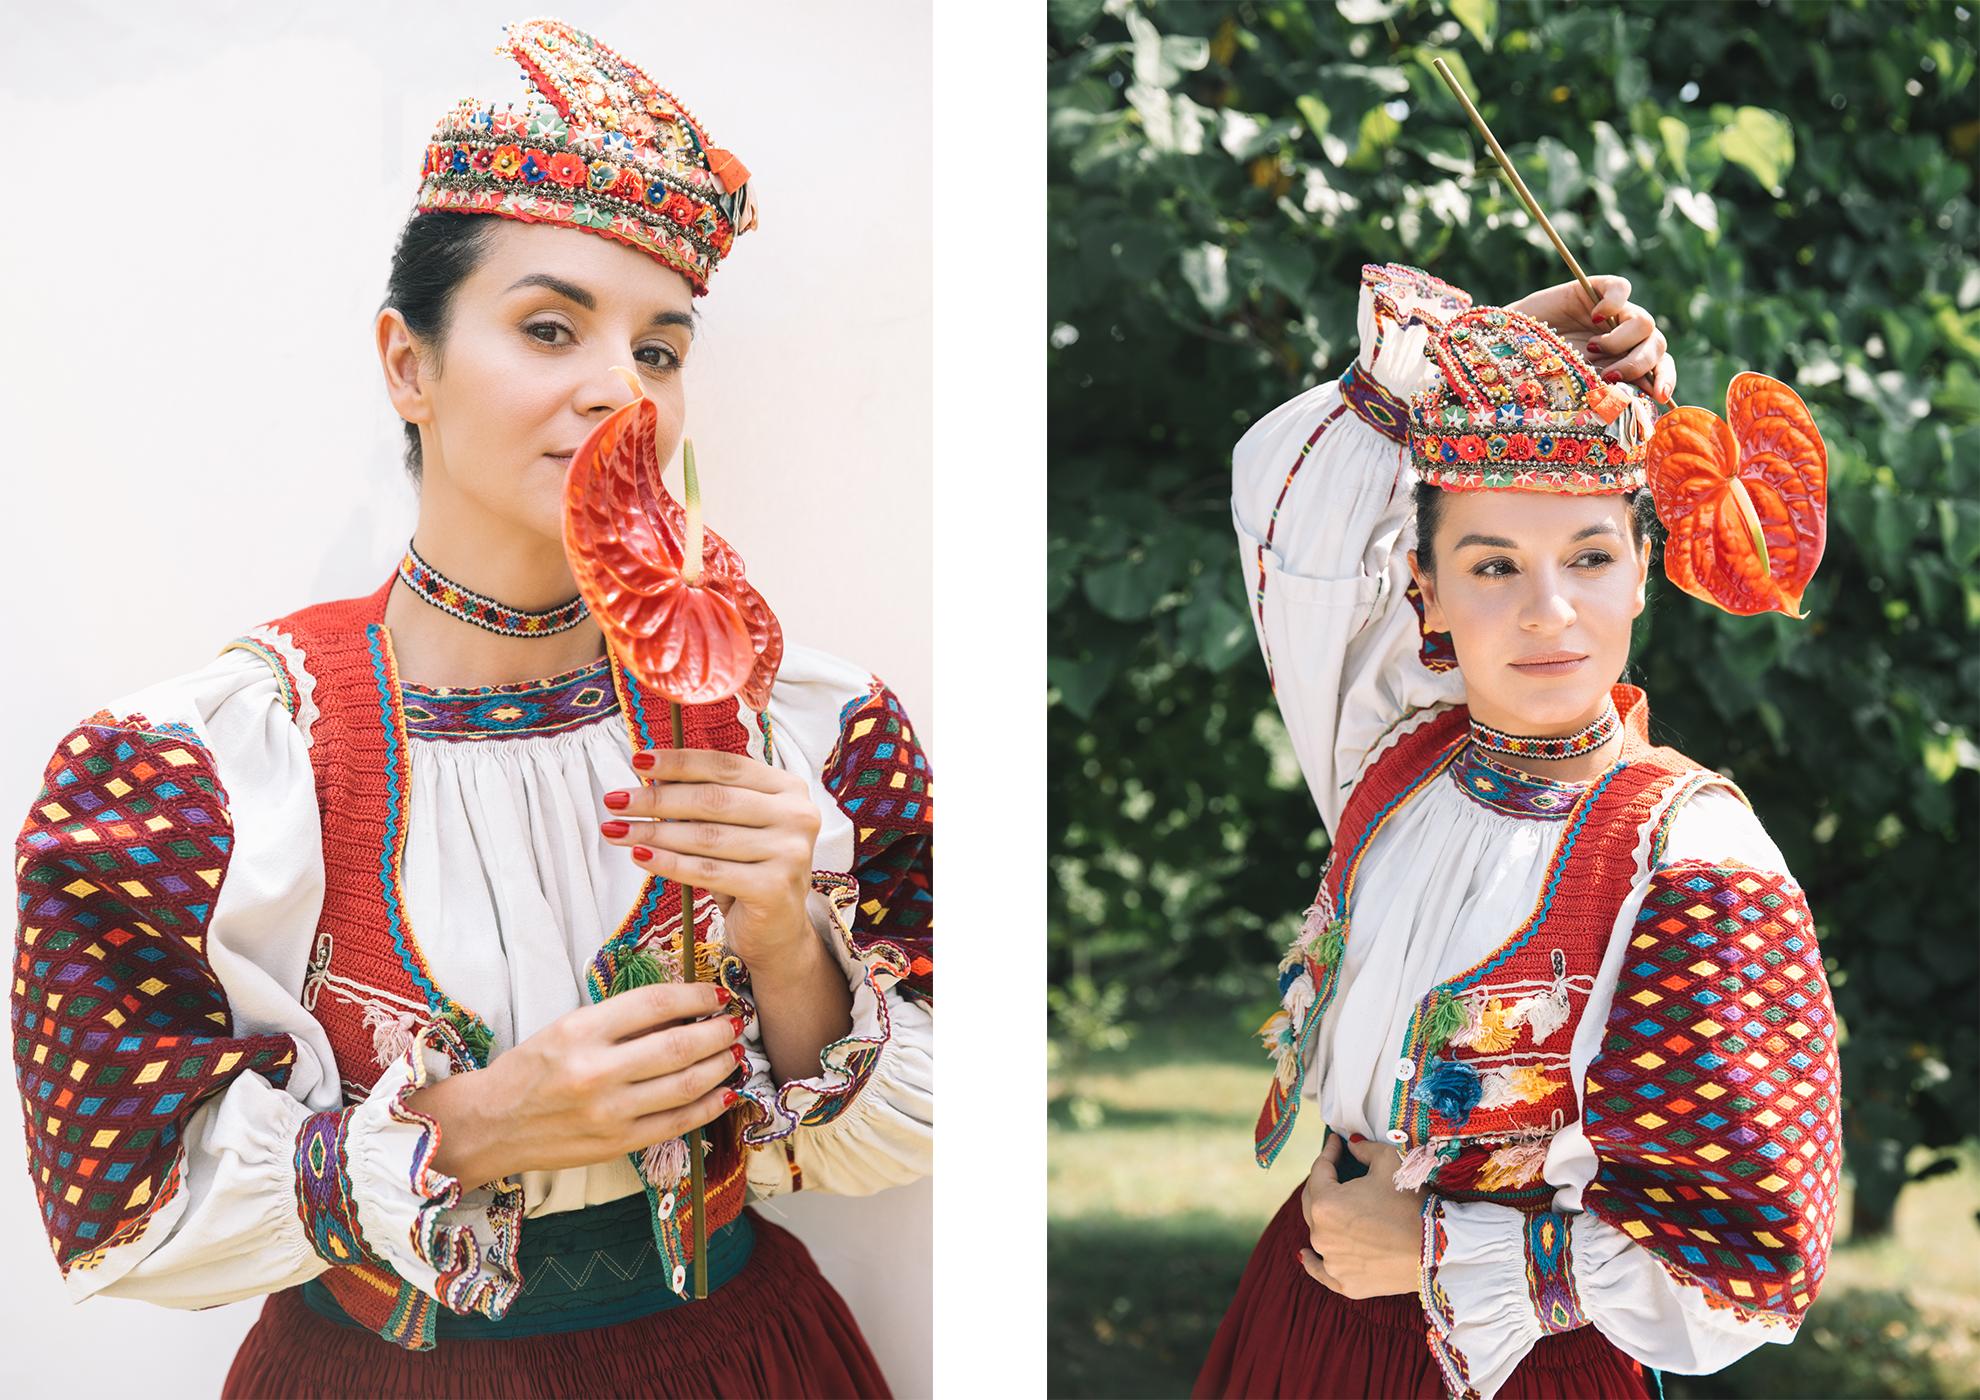 Natalka Yantso